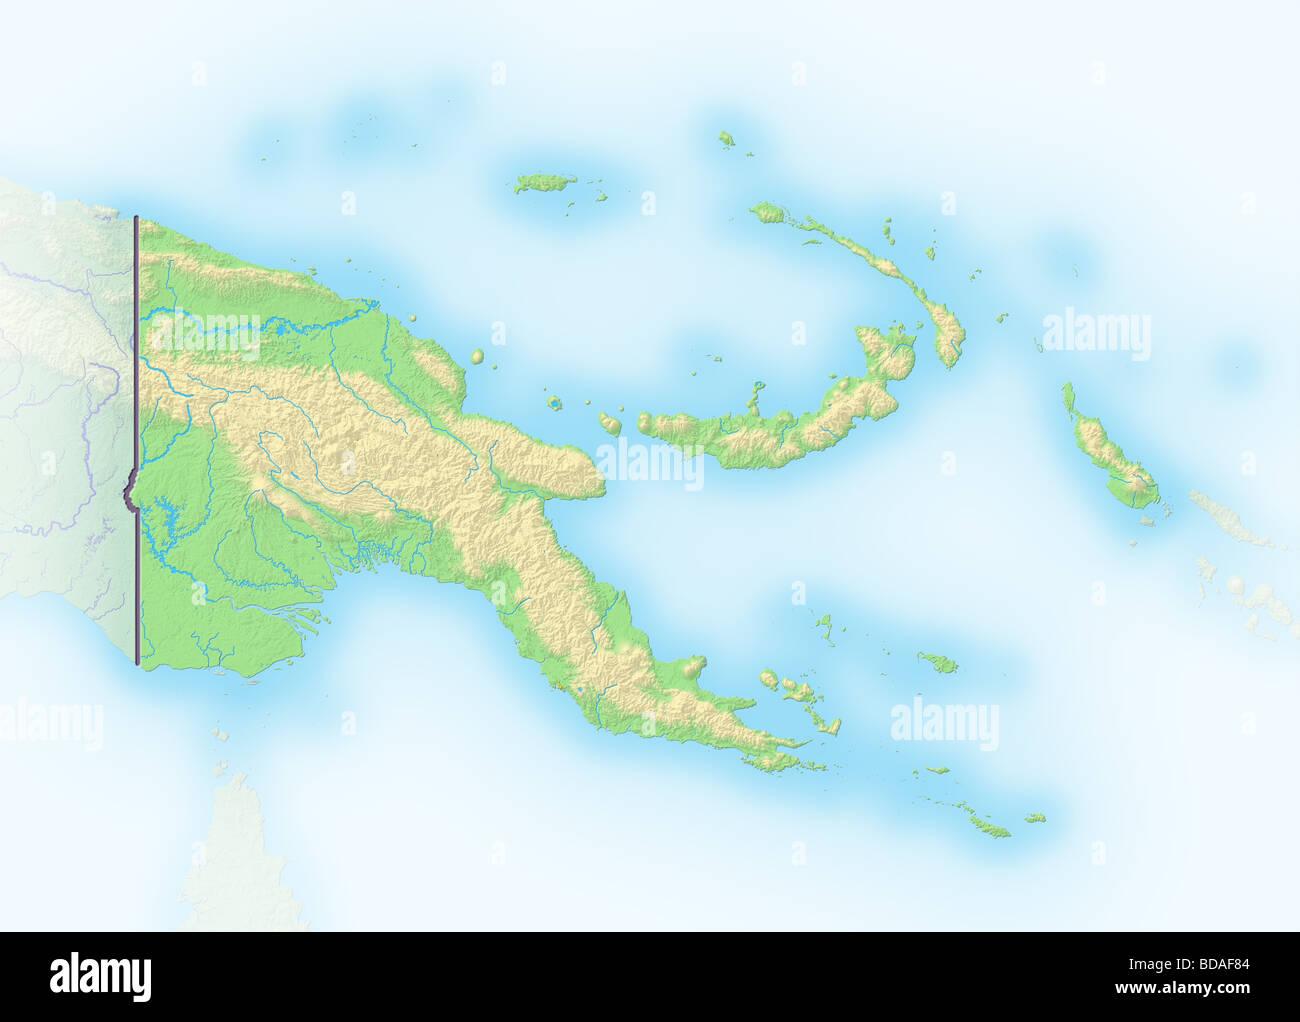 Map Of Papua New Guinea Stockfotos & Map Of Papua New Guinea Bilder ...